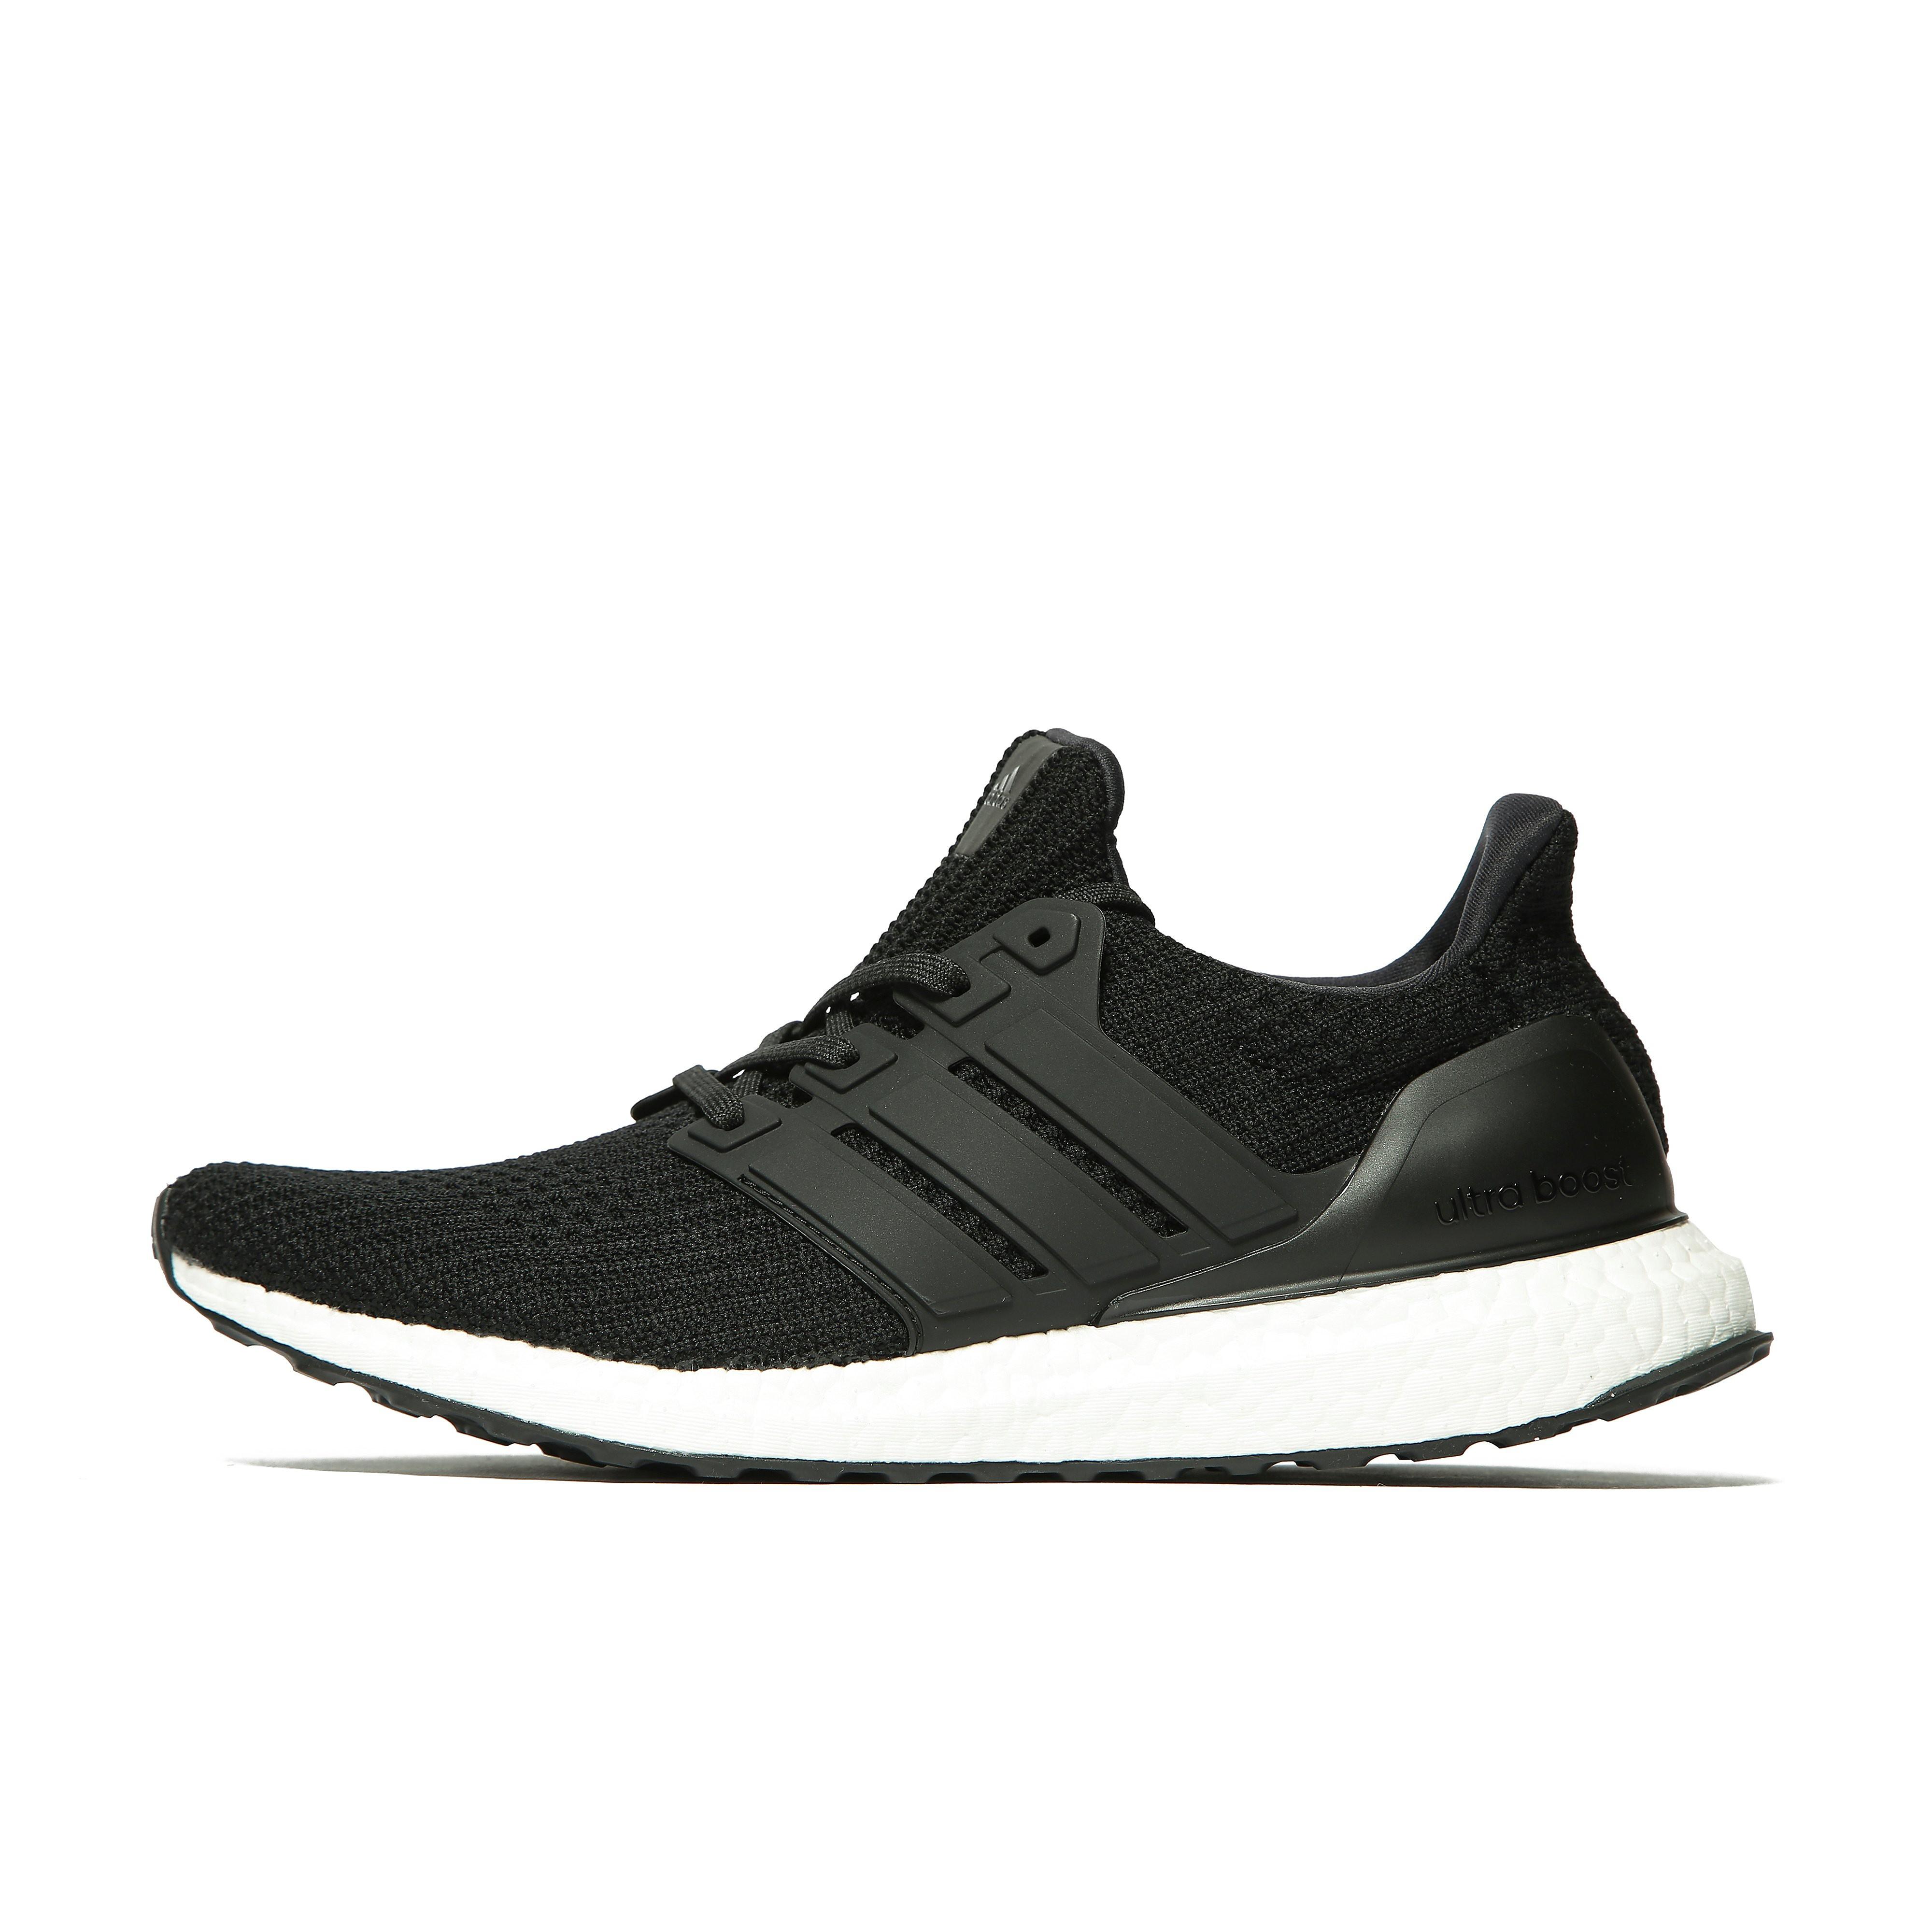 Men's adidas Ultraboost Running Shoes - Black, Black